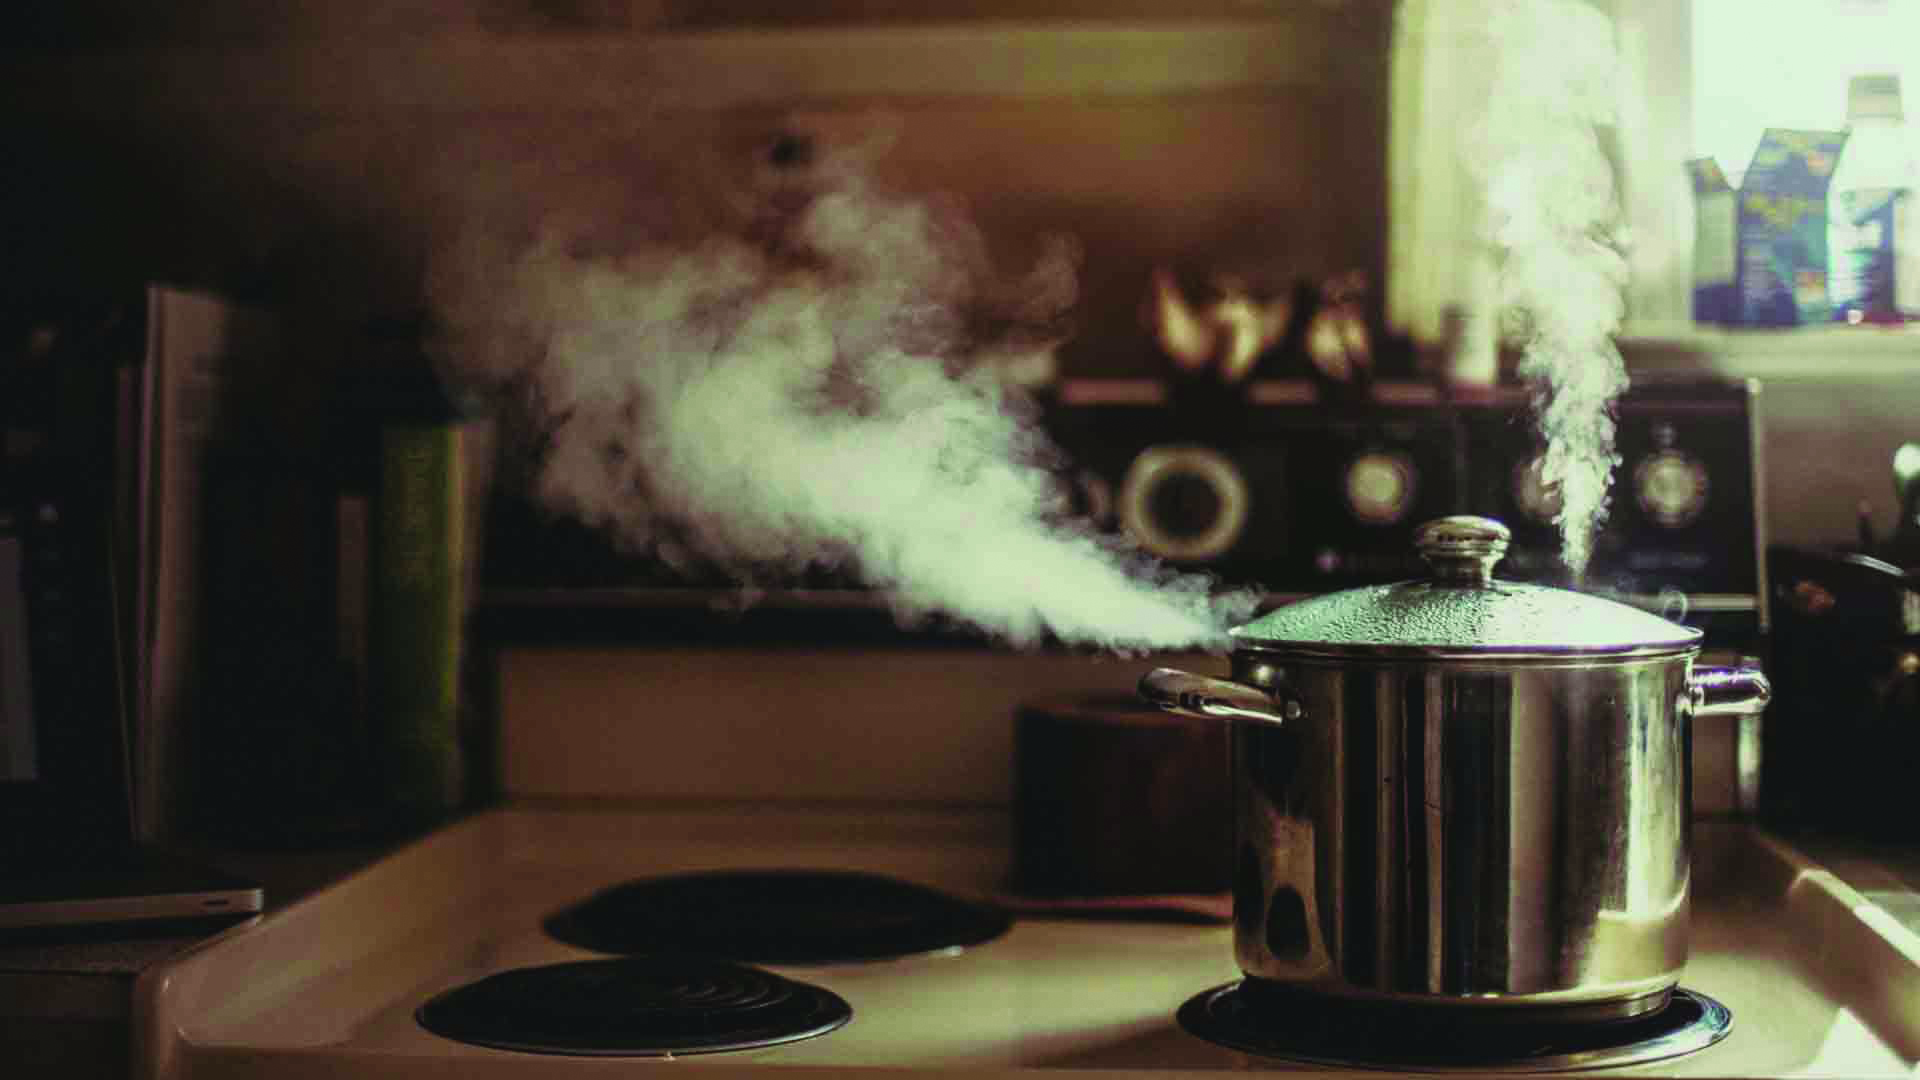 Boilingpot-1920x1080